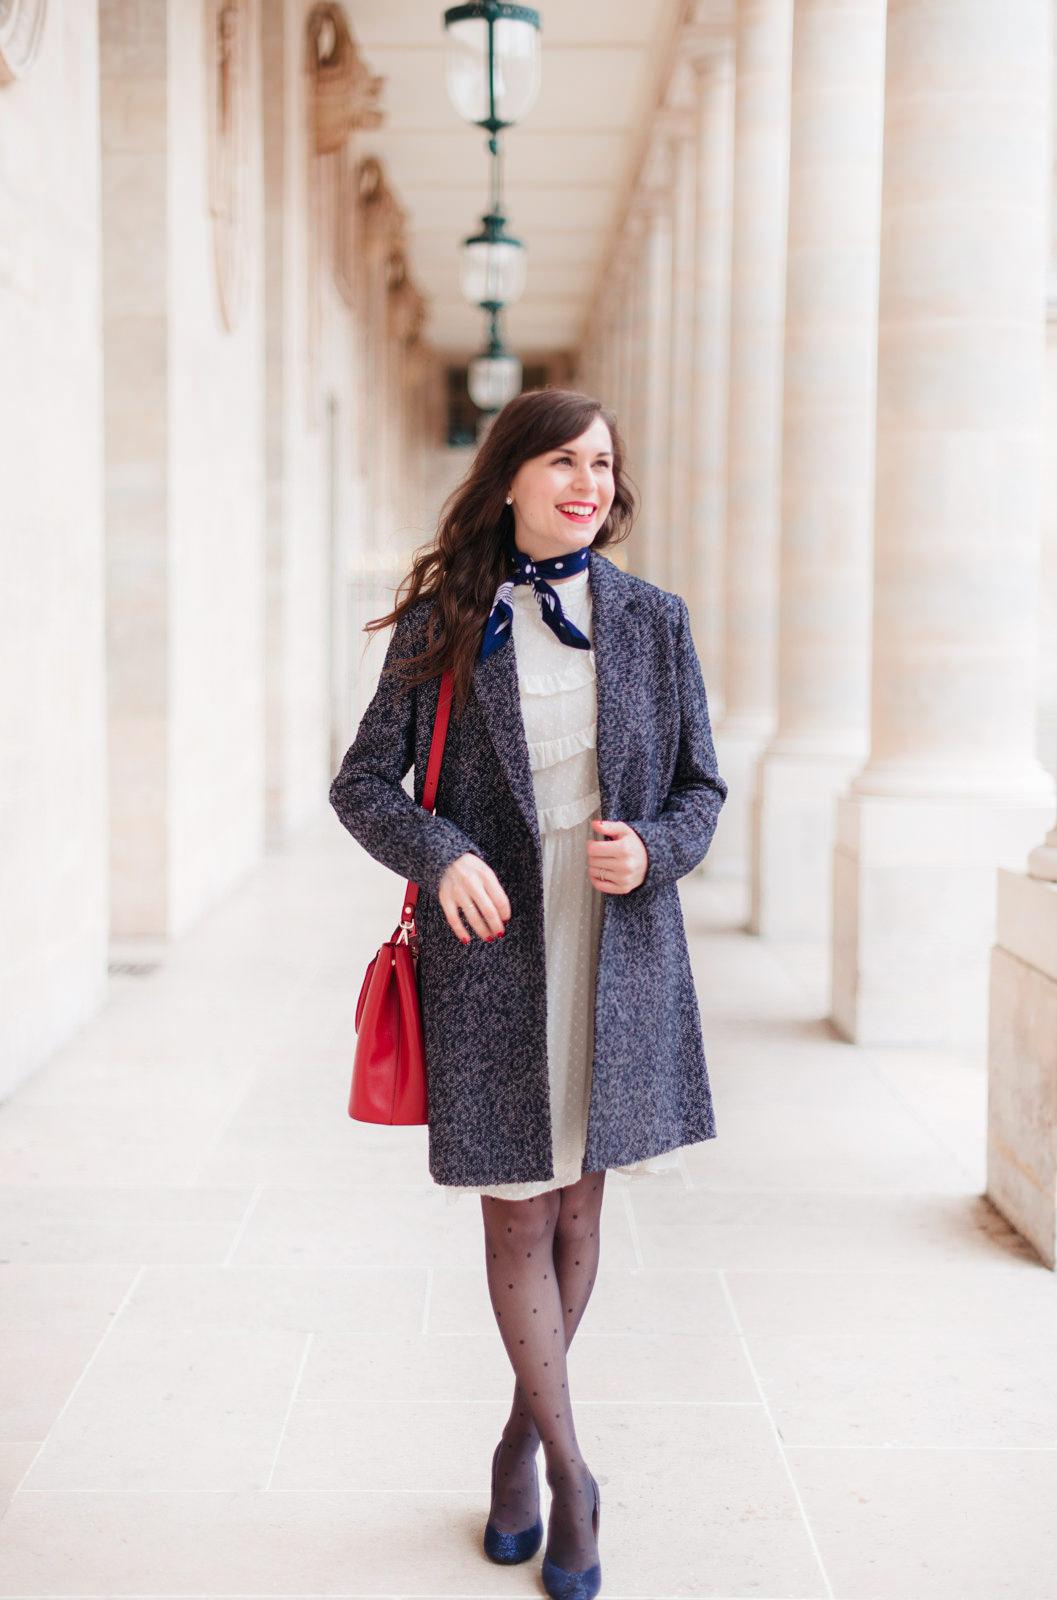 Blog-Mode-And-The-City-Lifestyle-Cinq-Petites-Choses-La-Note-Francaise-15